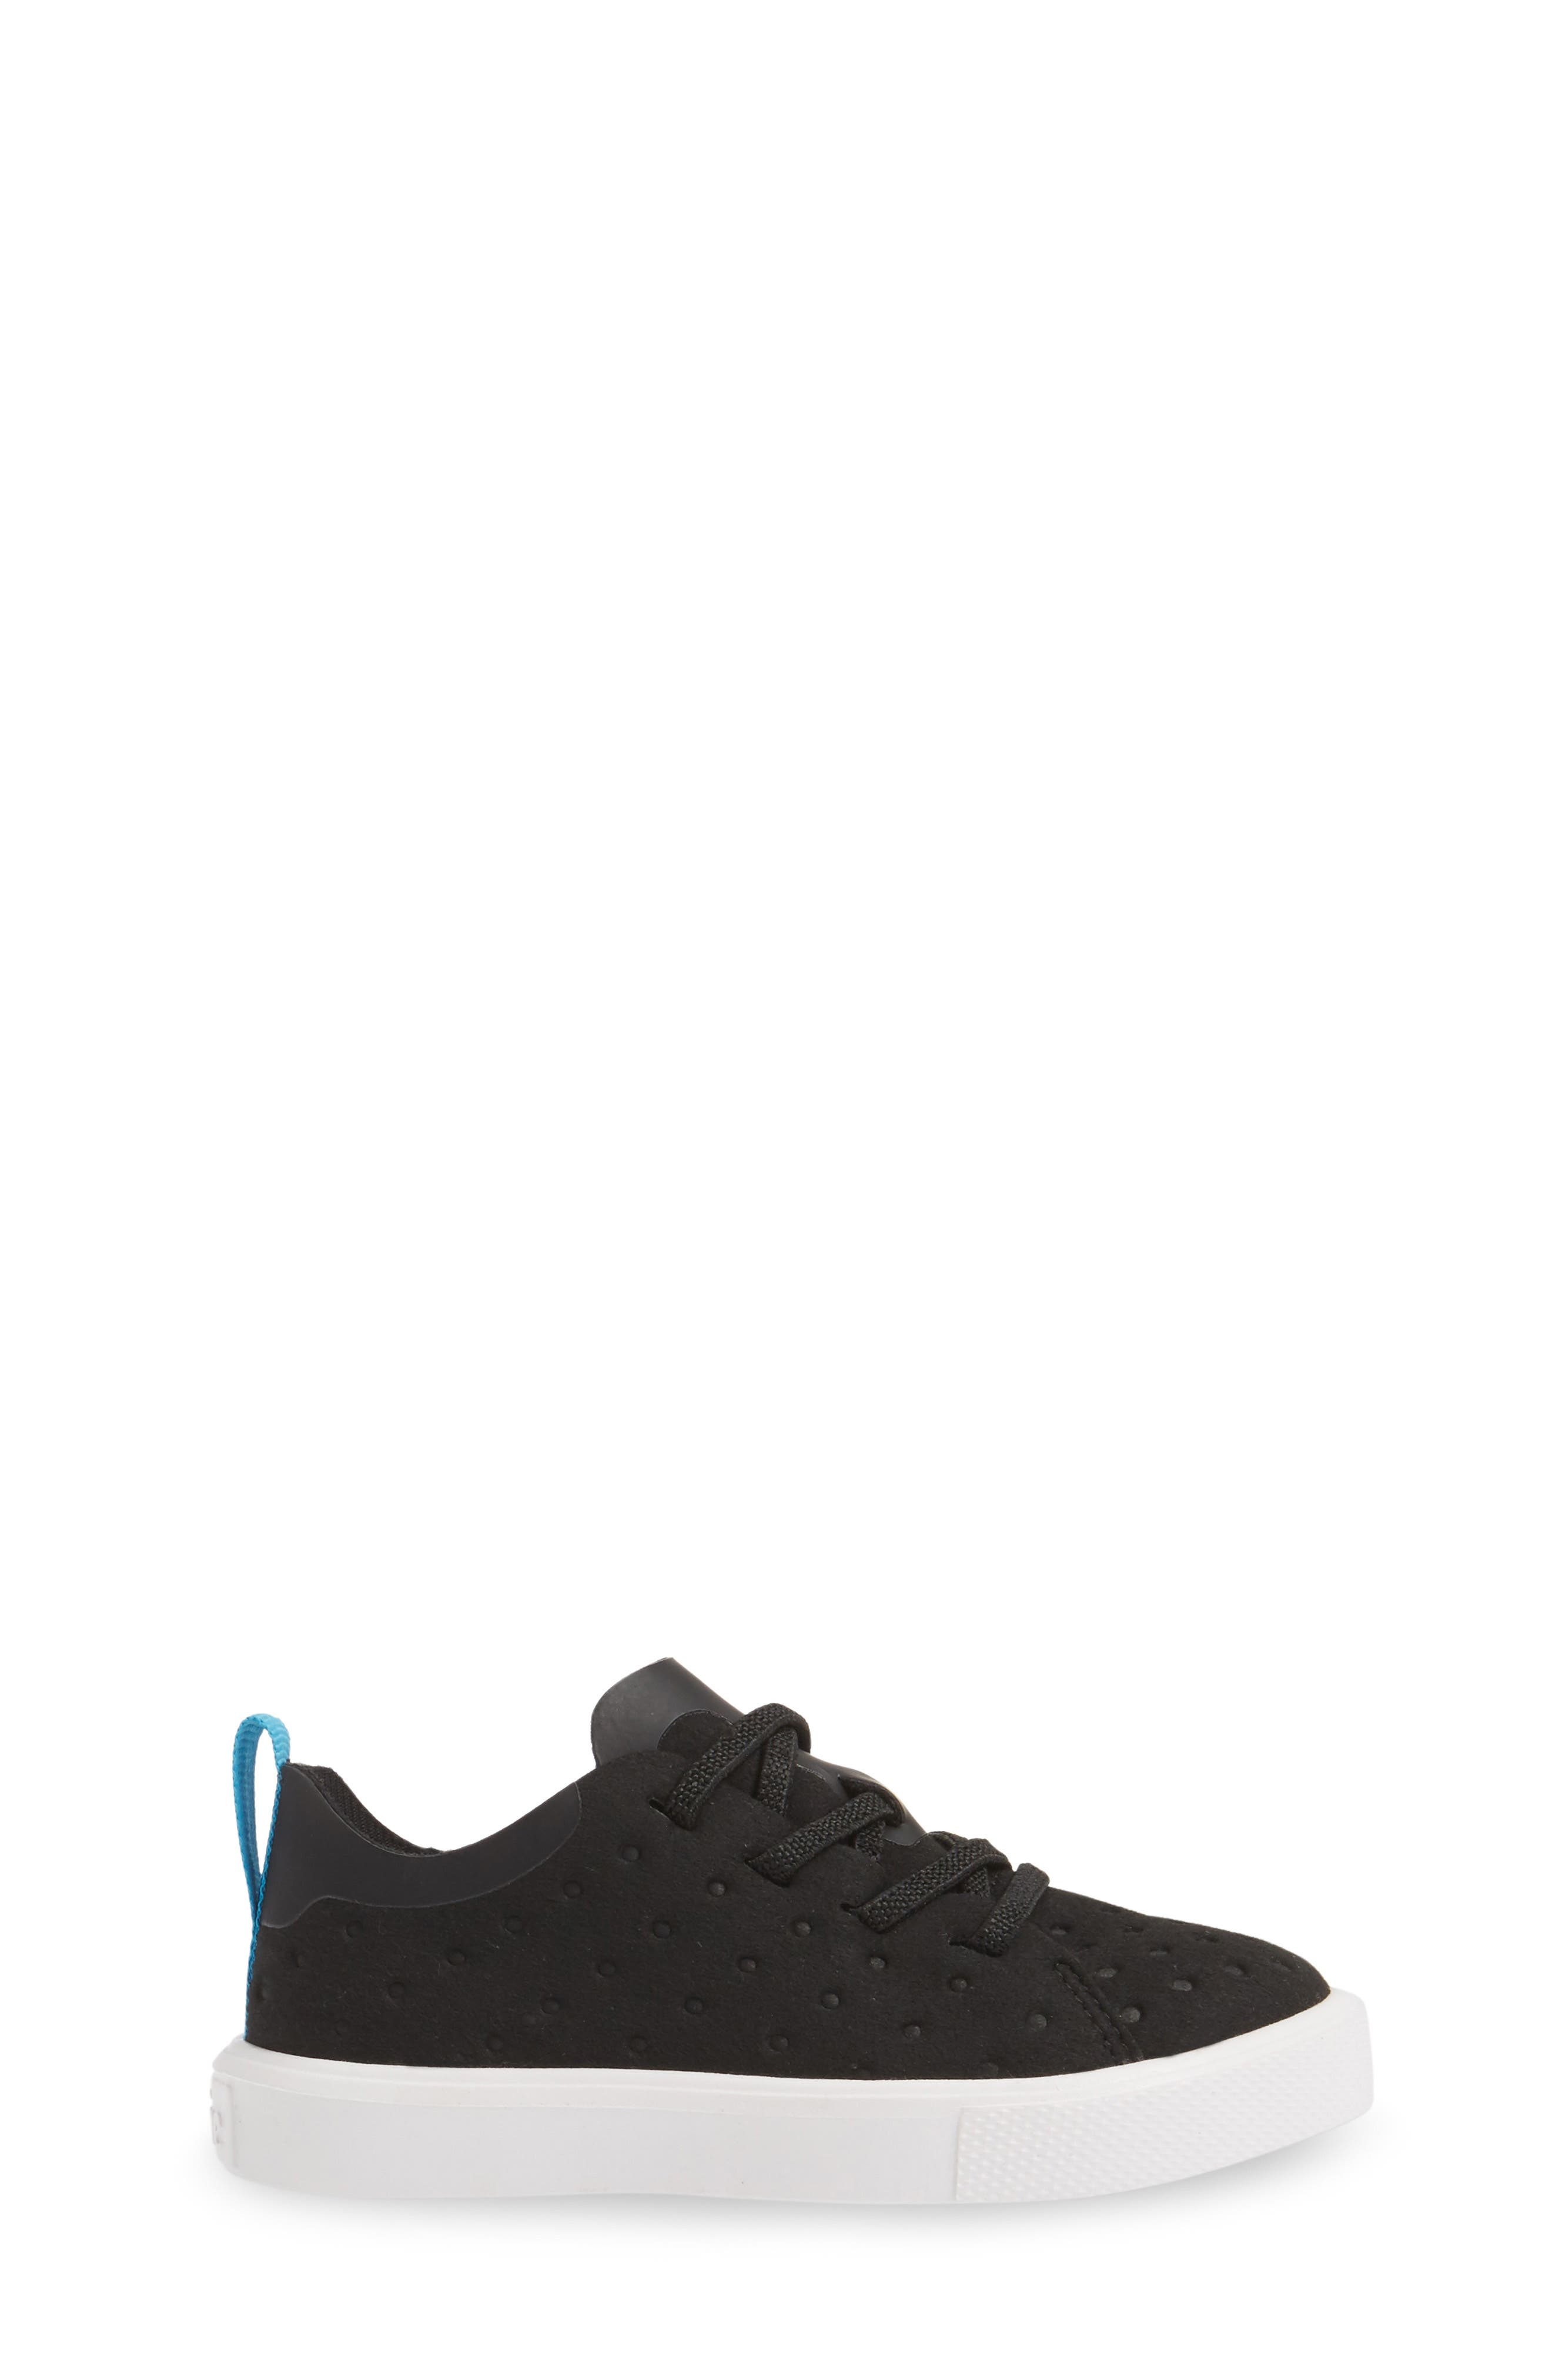 Monaco Sneaker,                             Alternate thumbnail 3, color,                             004